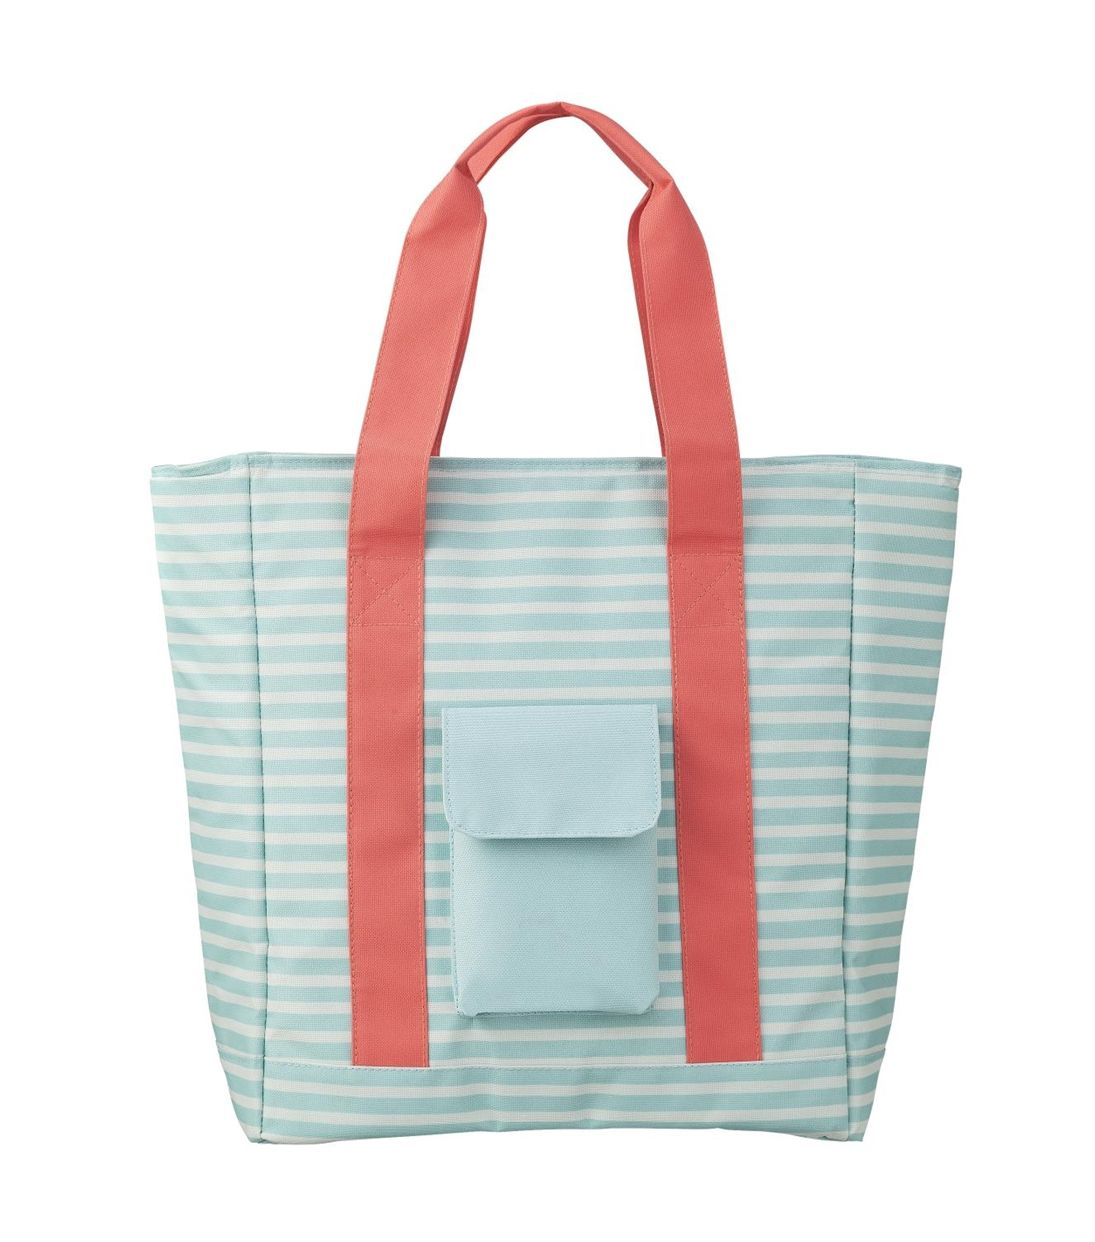 Super 10 euro hema koeltas | Tuin - Bags, Gym Bag en Diaper Bag SG-05